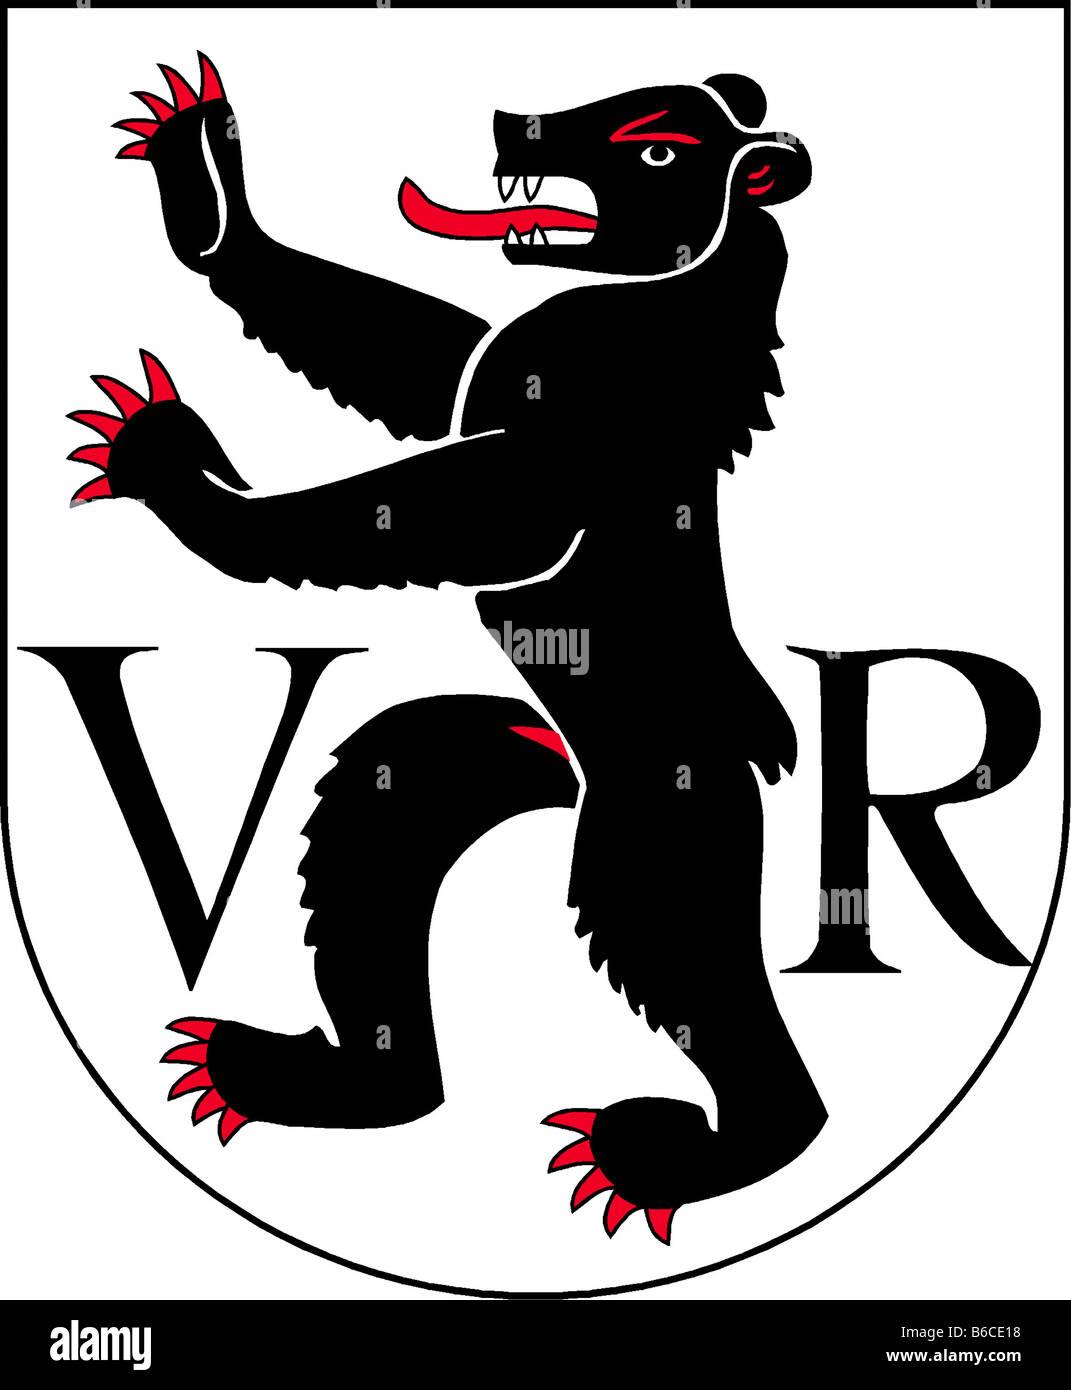 illustration flag of canton of appenzell ausserrhoden switzerland - Stock Image